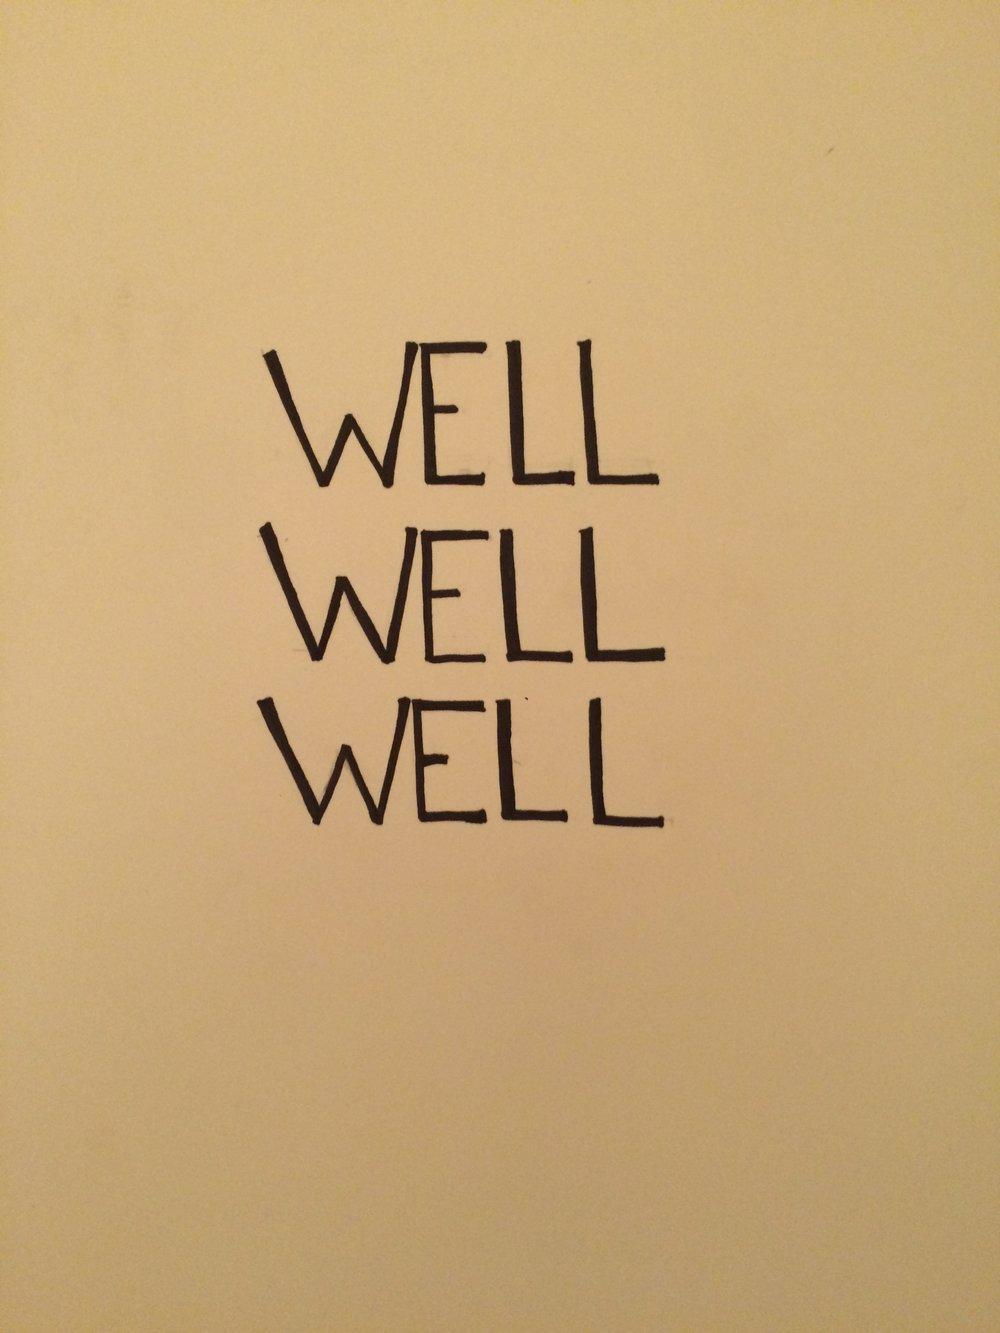 well well well